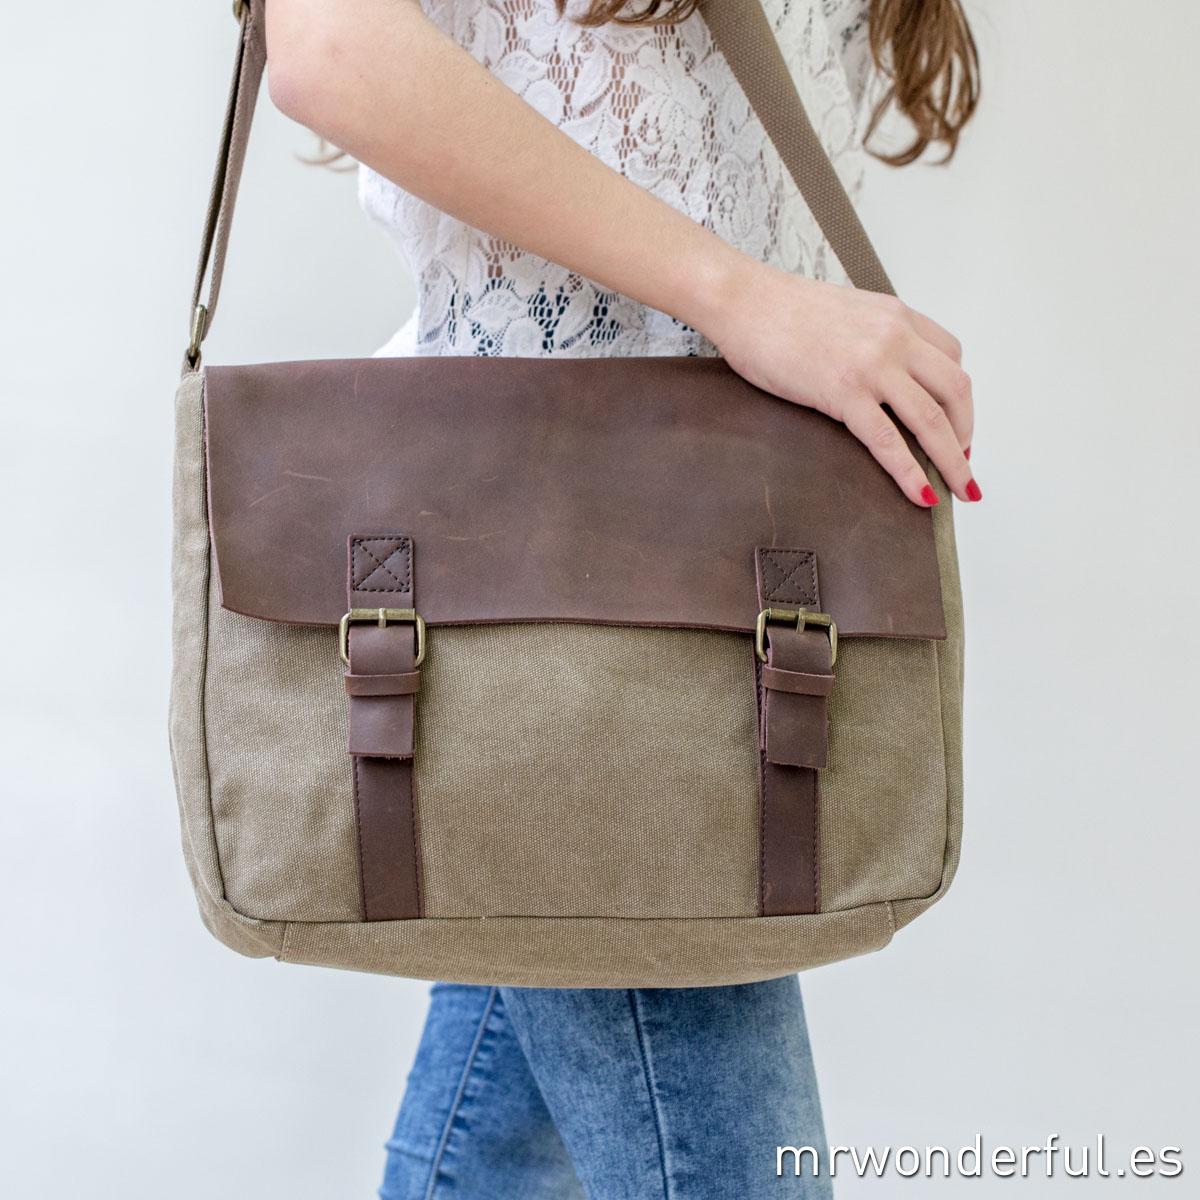 mrwonderful_bags_588-184-Kaki-26